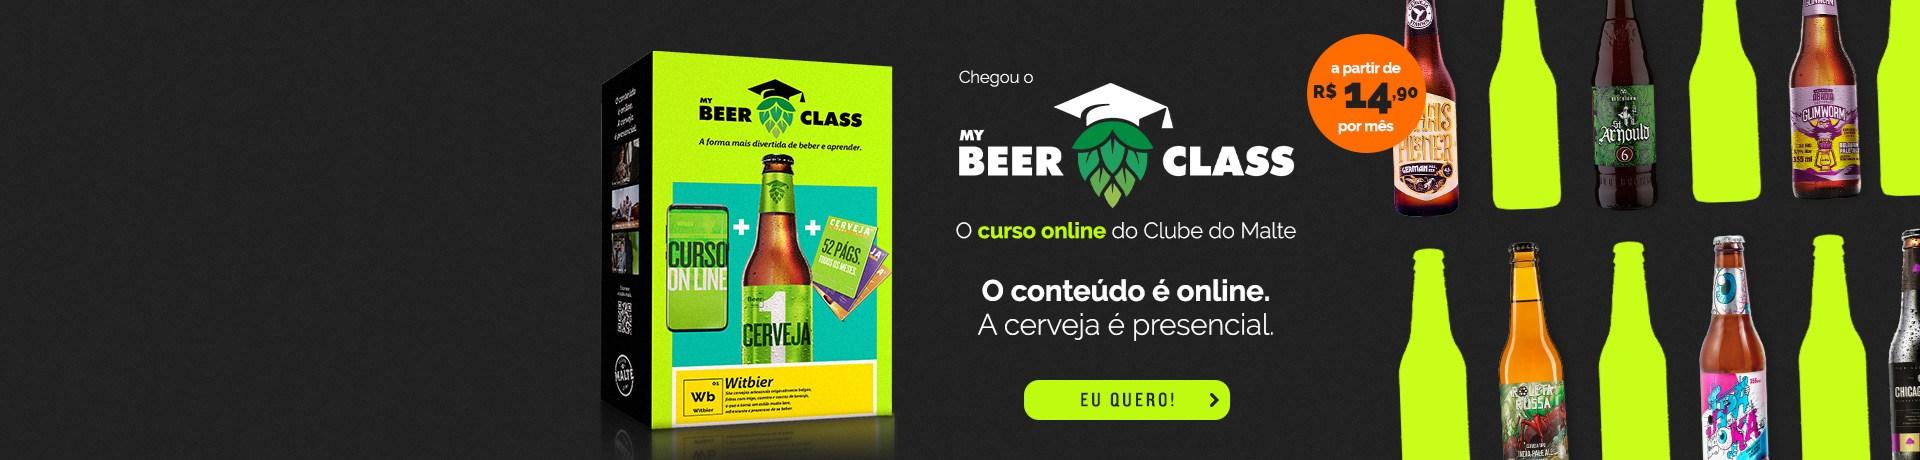 My Beer Class - Home